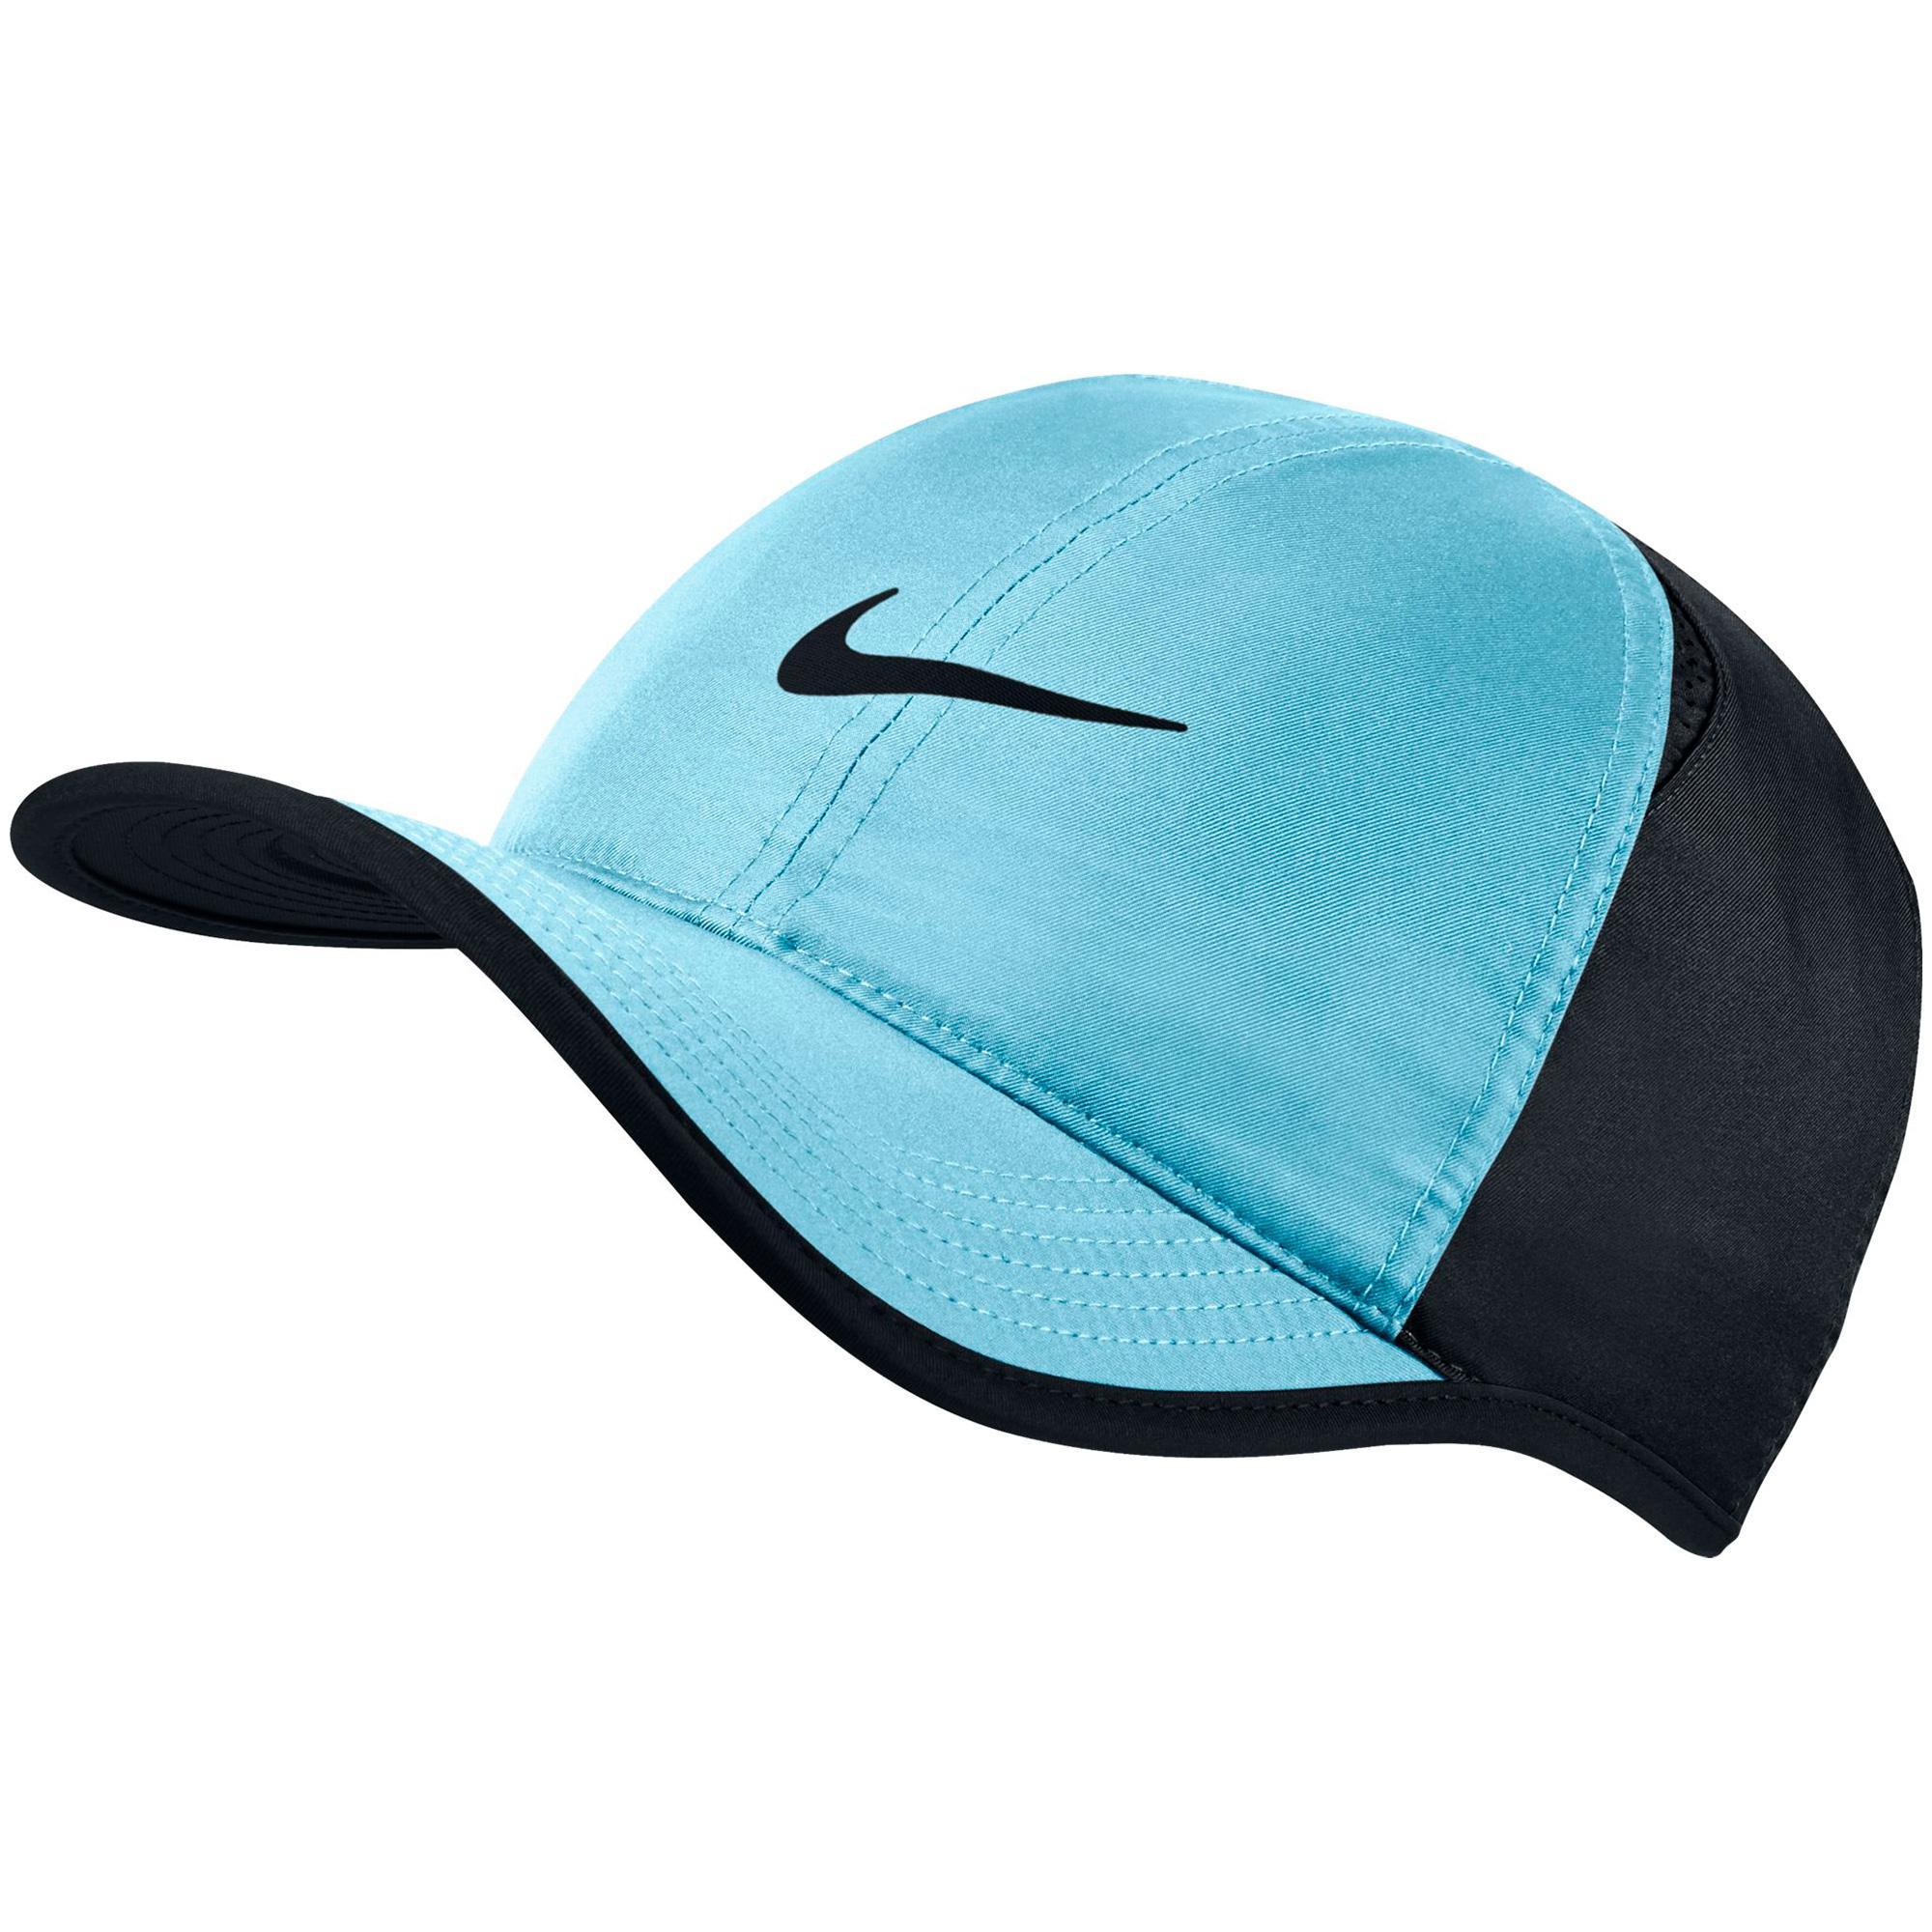 7725267f976 Nike Feather Light Adjustable Cap - Sky Blue Black - Tennisnuts.com